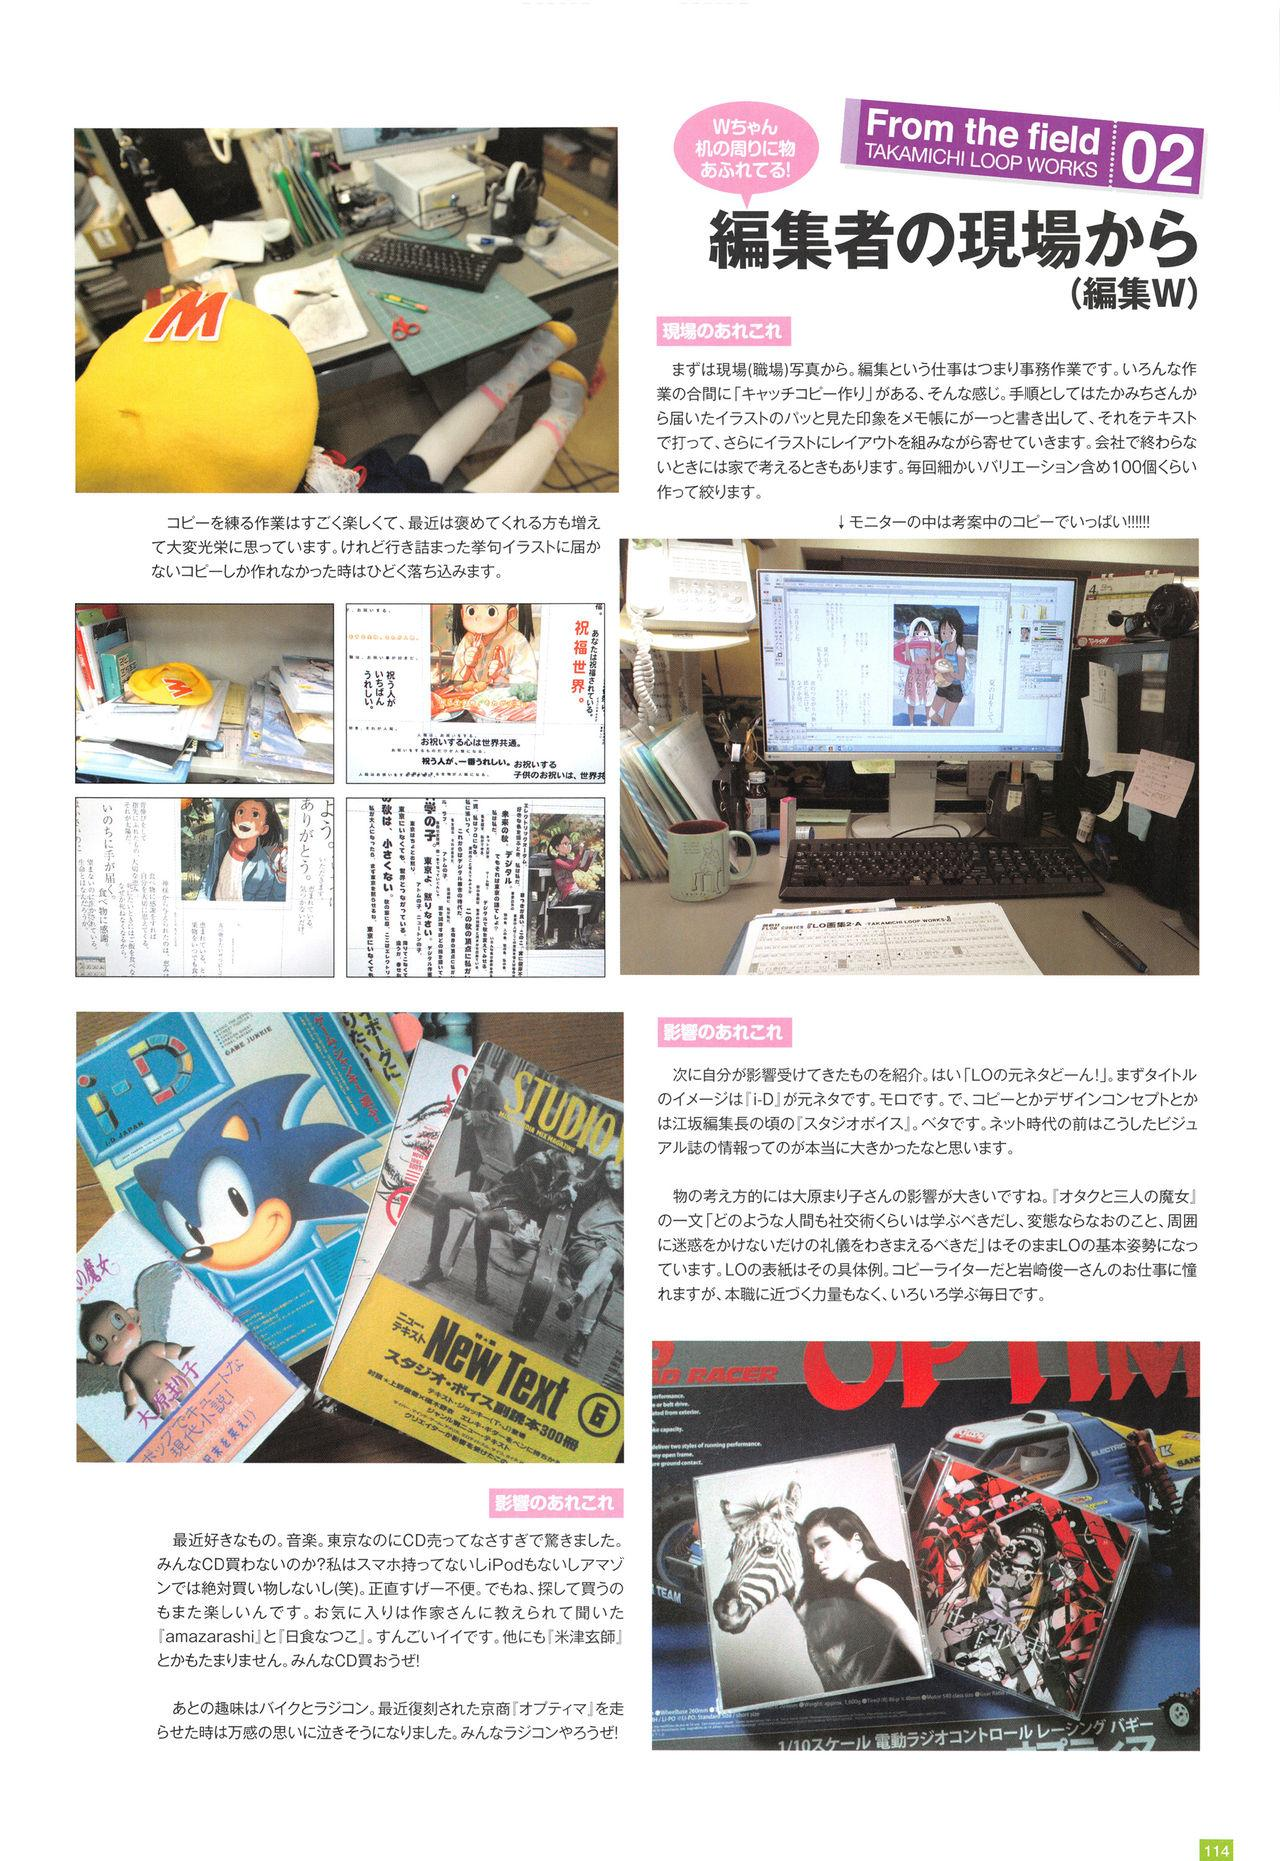 LO Artbook 2-A TAKAMICHI LOOP WORKS 116